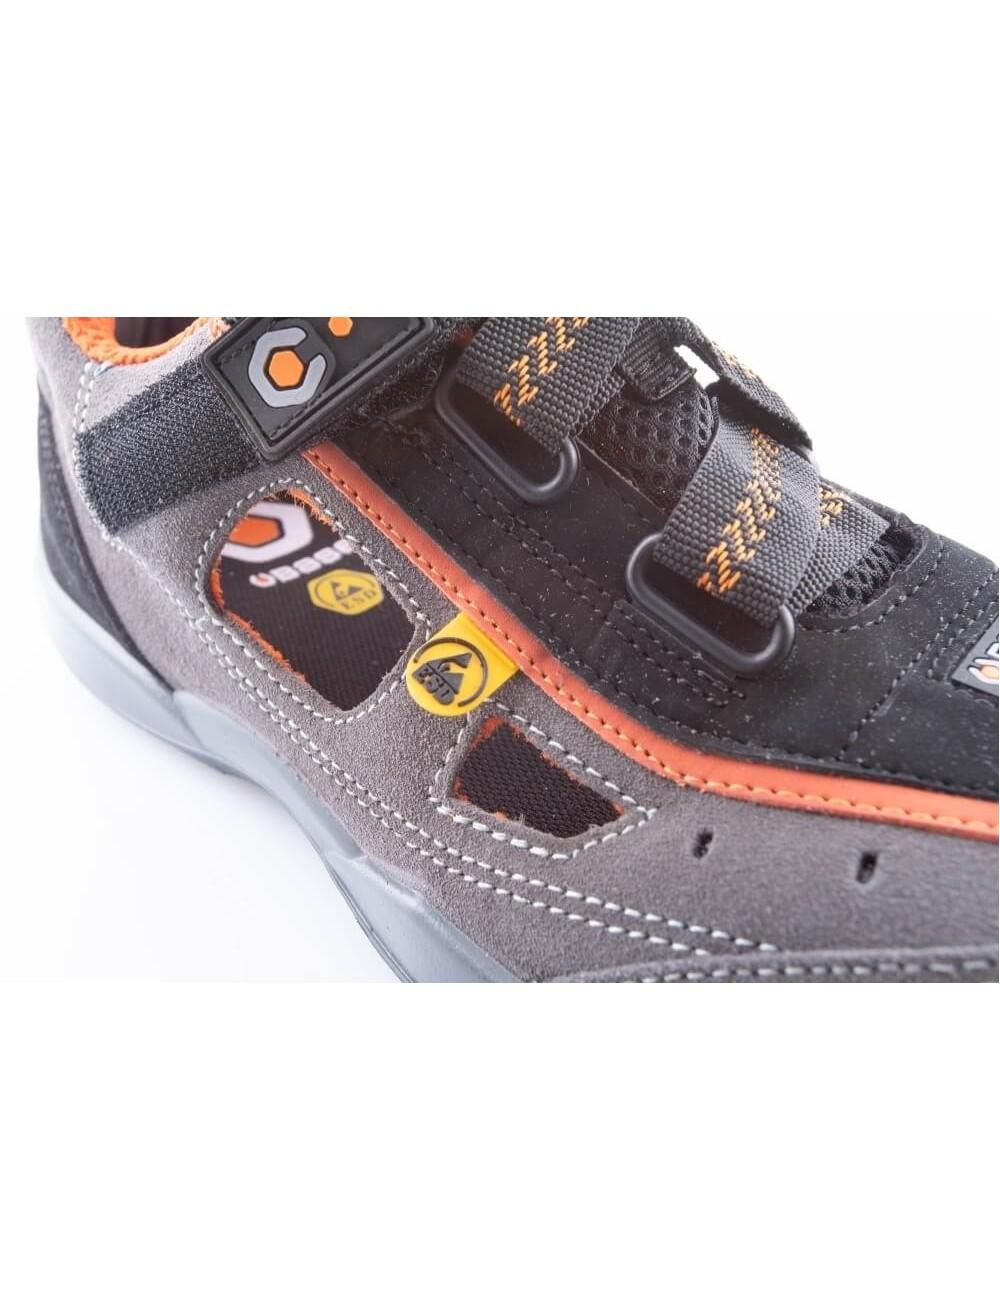 Sandały robocze BASE AEROBIC S1P